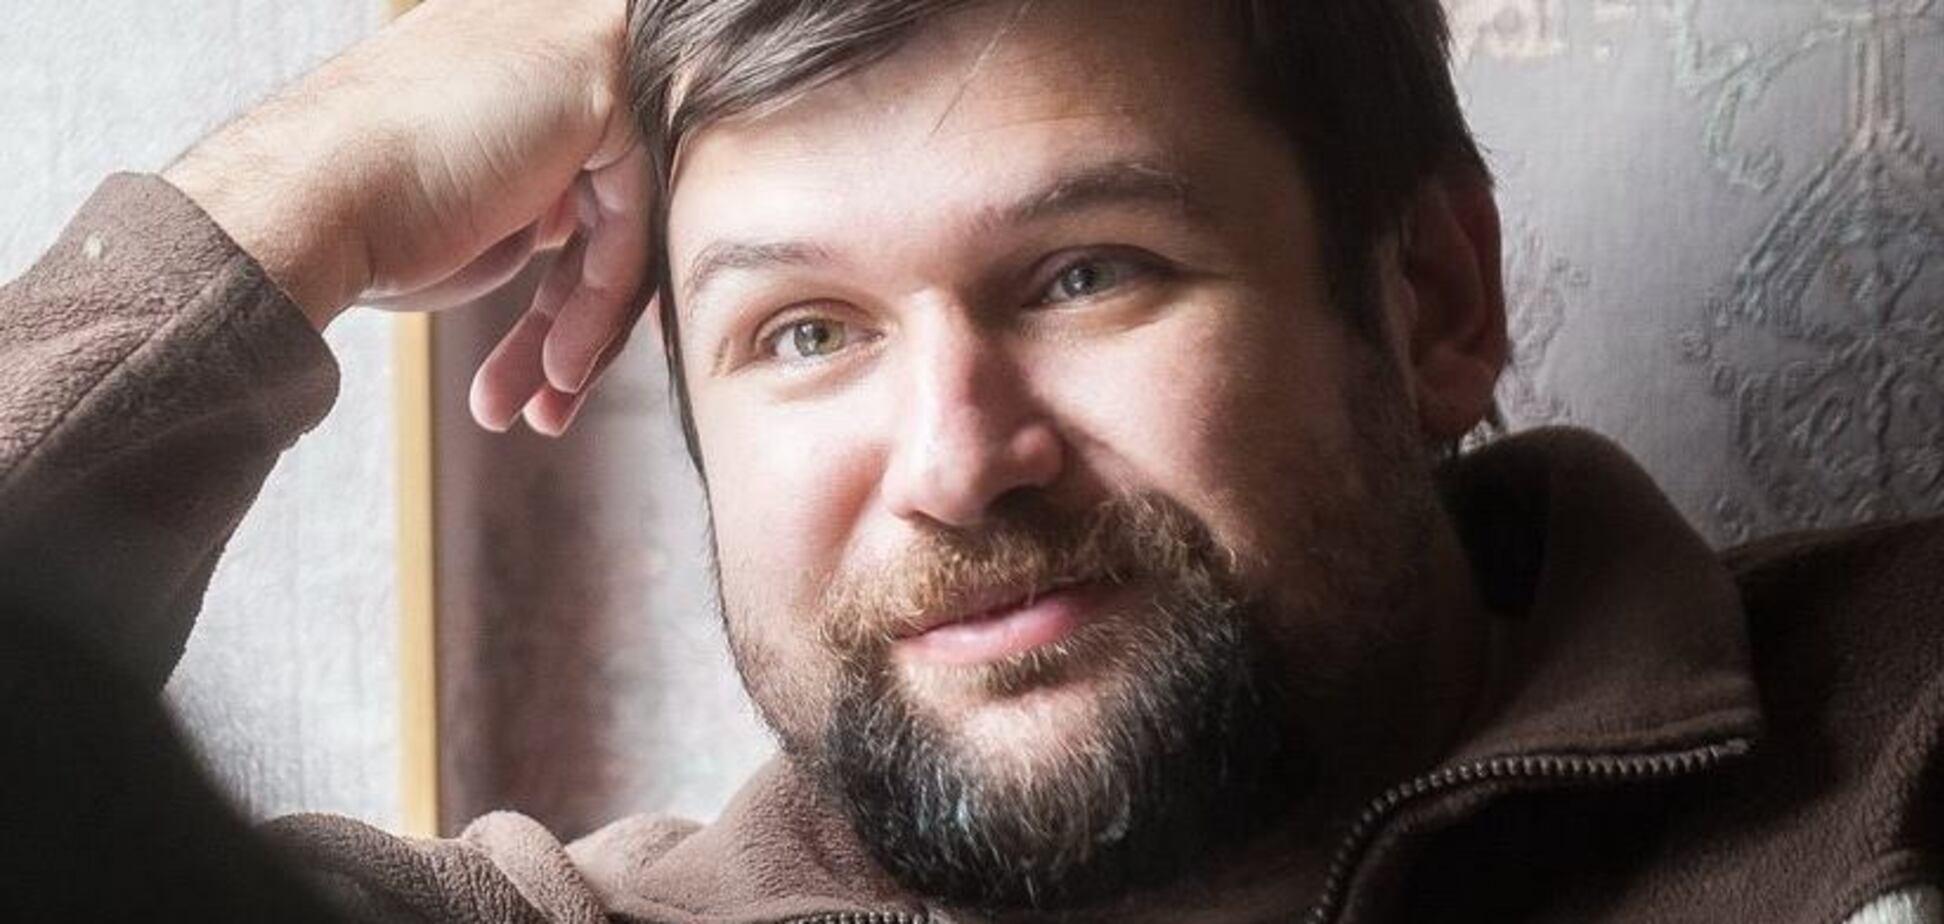 Журналист Сергей Сидоров о разбитом бюсте Сталина